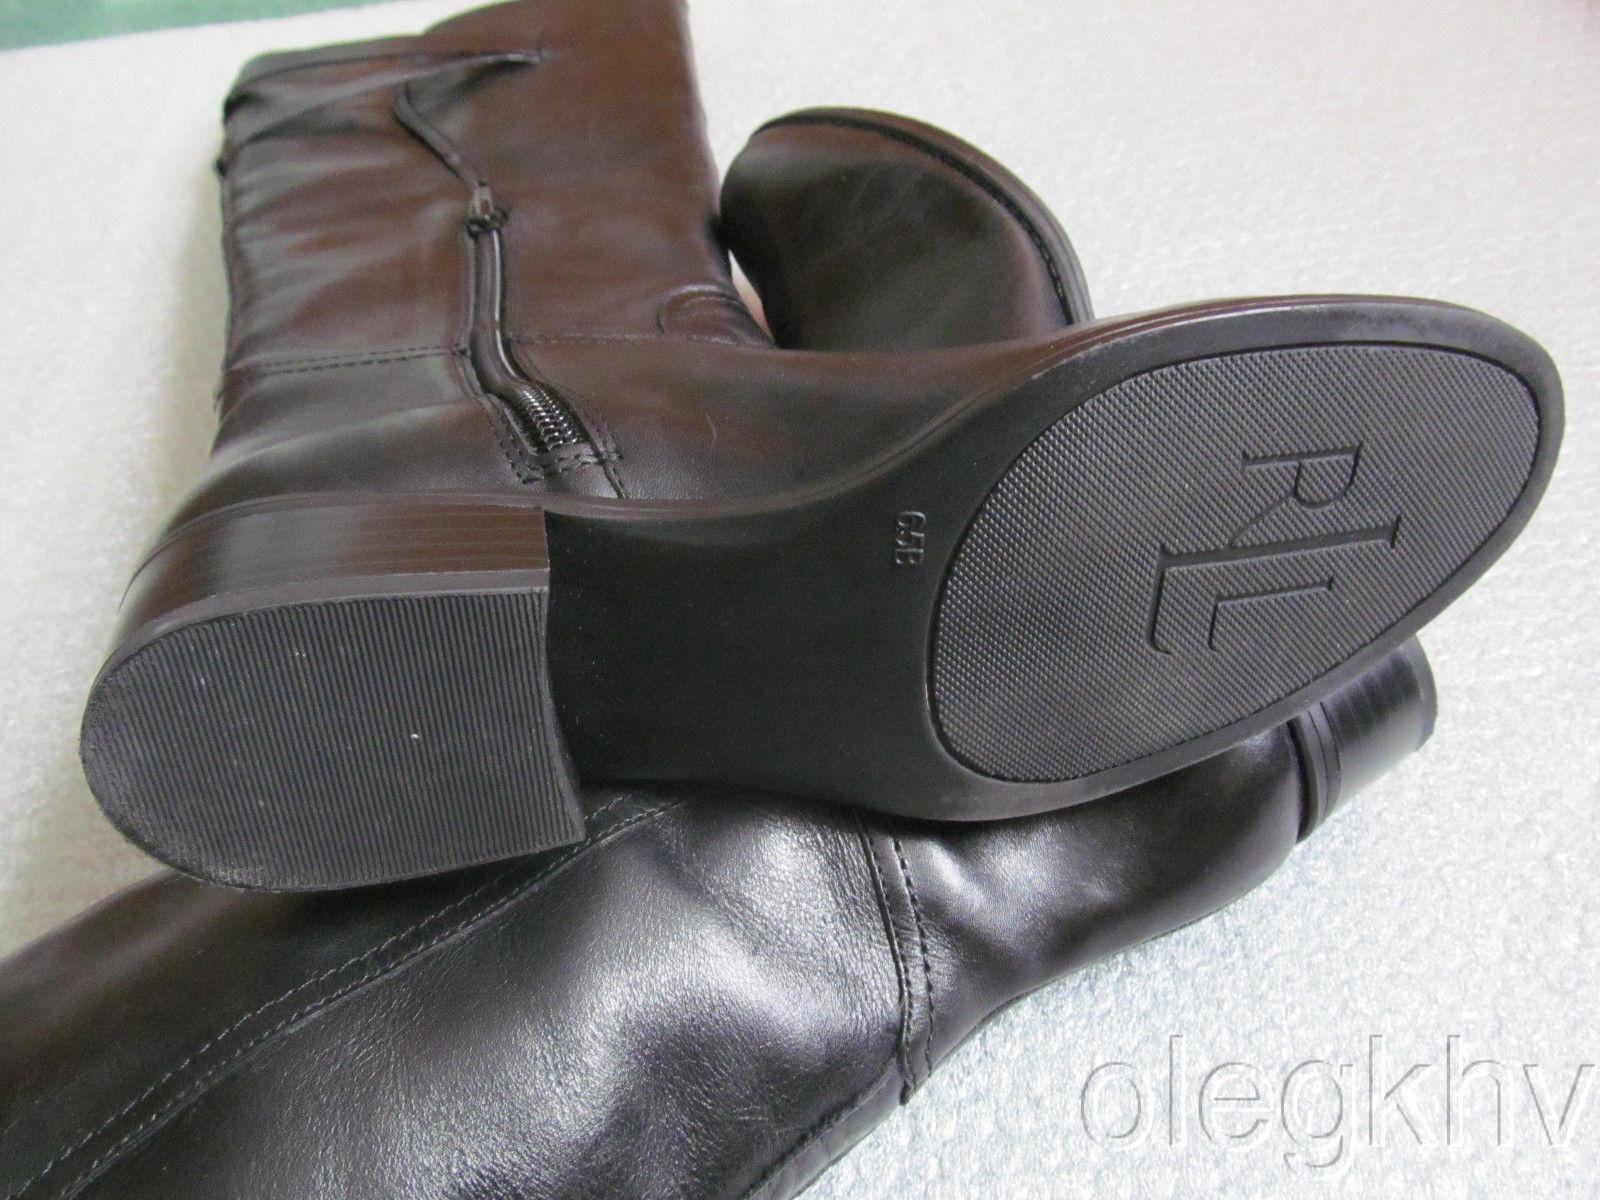 Nueva Con Talla Caja Ralph Lauren Maren bruñido Pantorrilla Cuero botas Talla Con 6.5 8b77e7